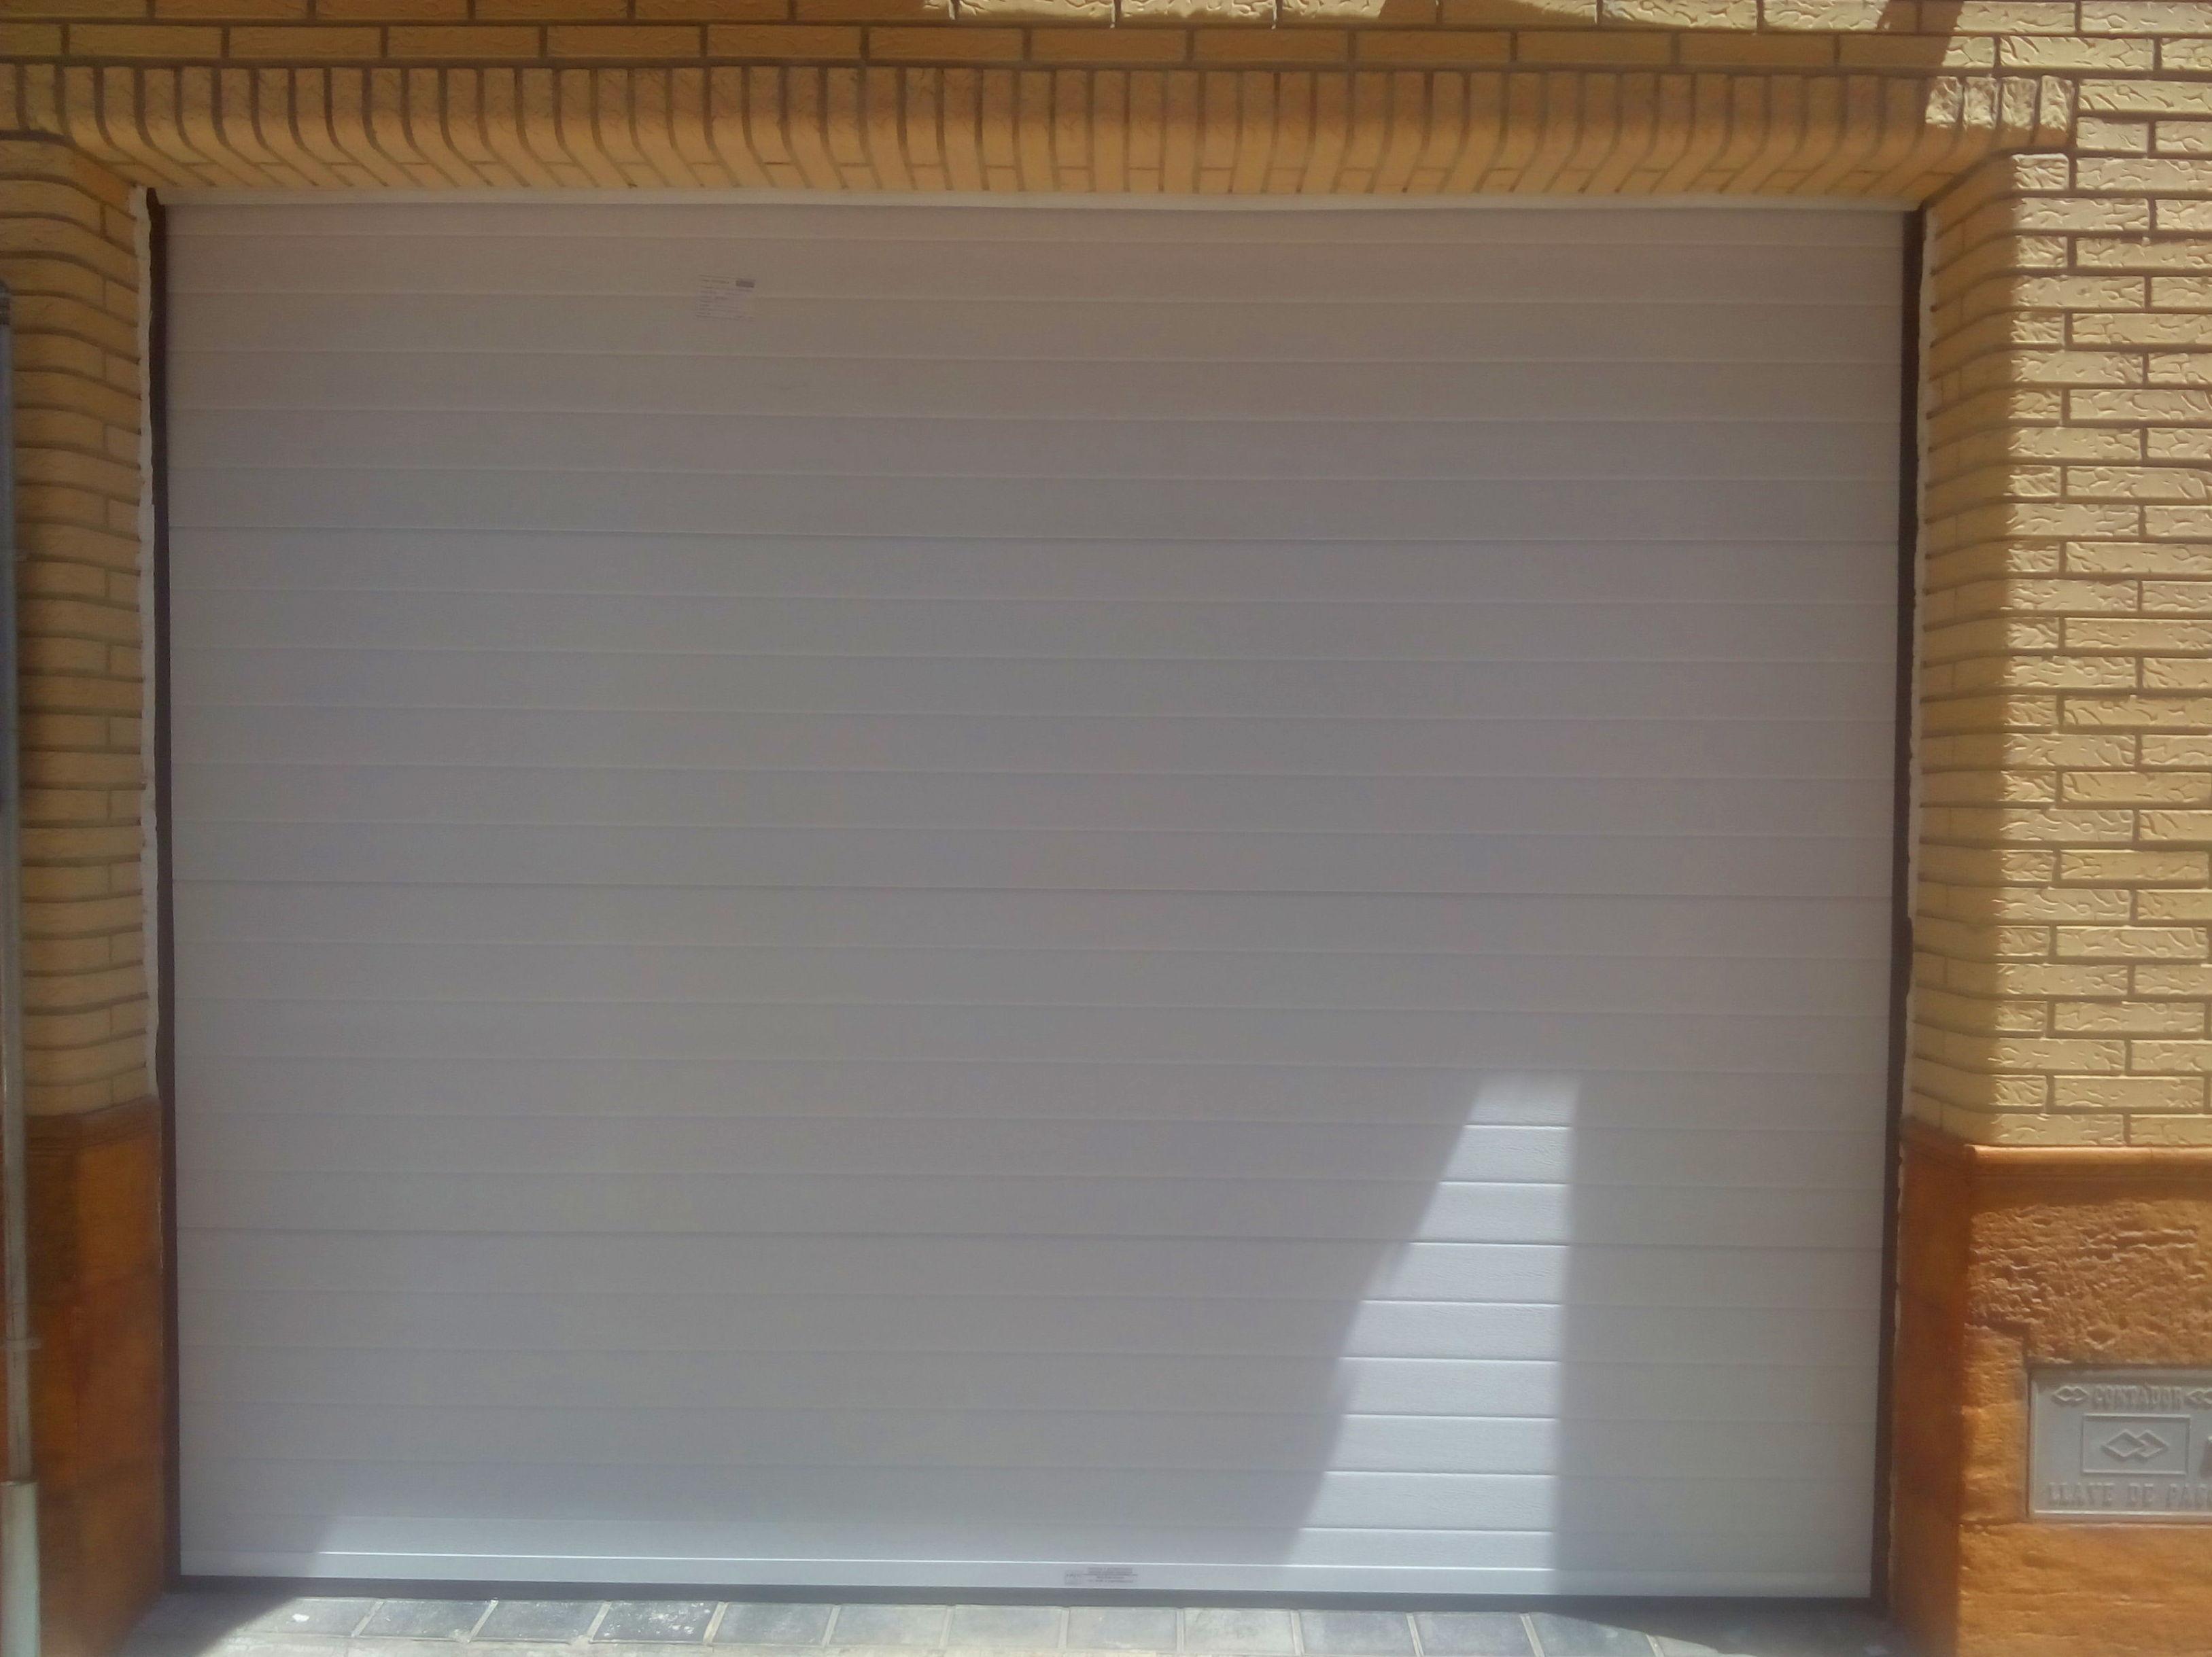 Puerta Seccional gofrada blanca. montada sobre pared sin premarco ( vista exterior )